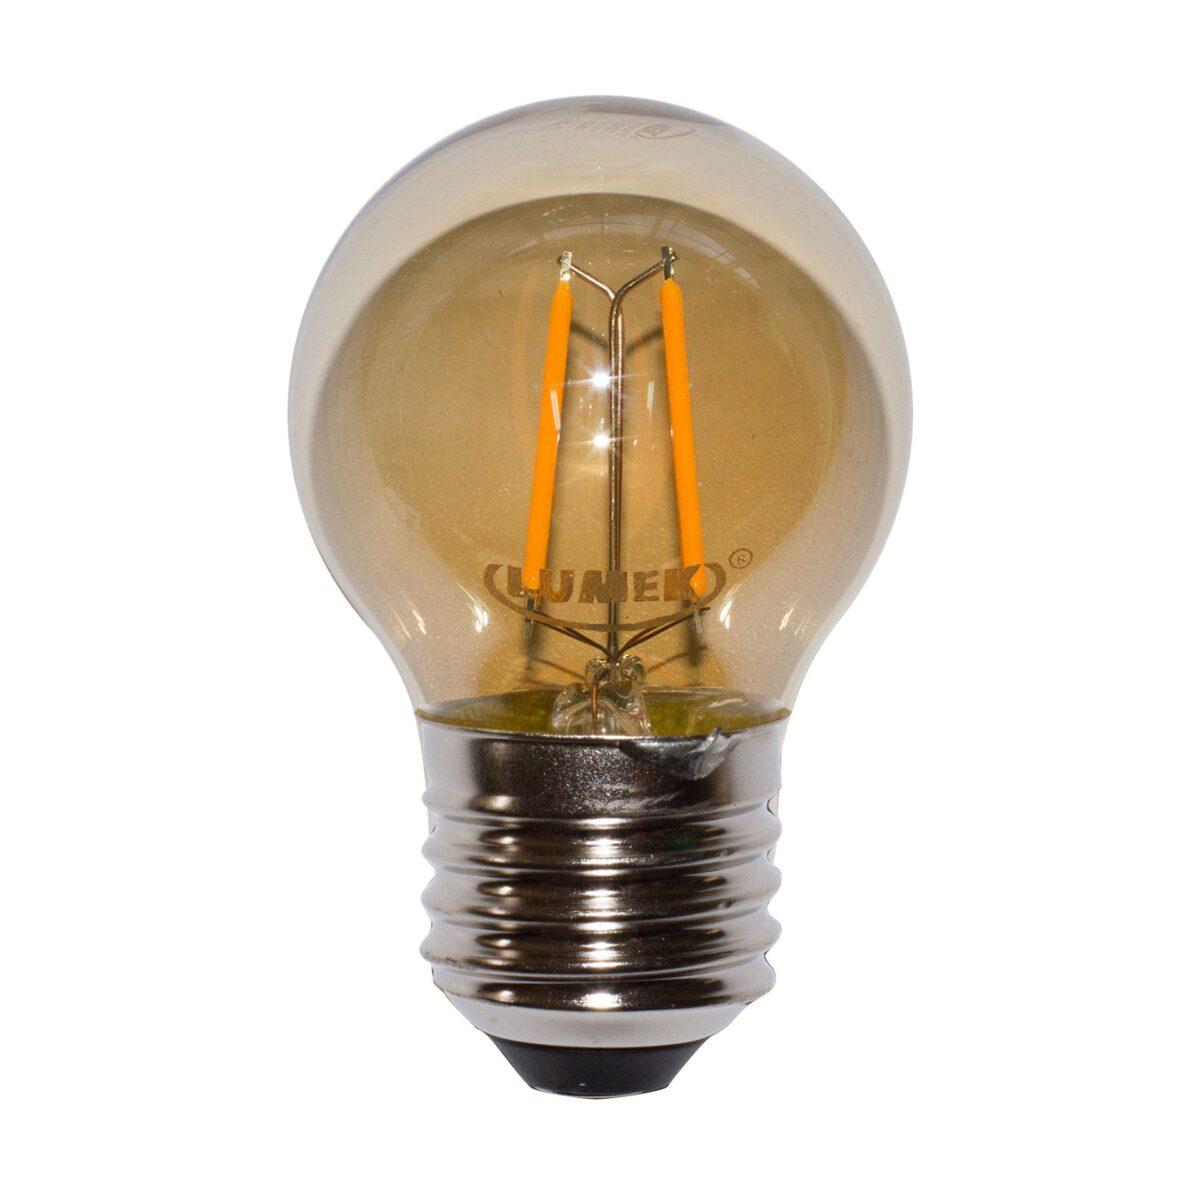 LED ECO VINTAGE AMBAR 2W 2700K 120V E27 LUMEK_1